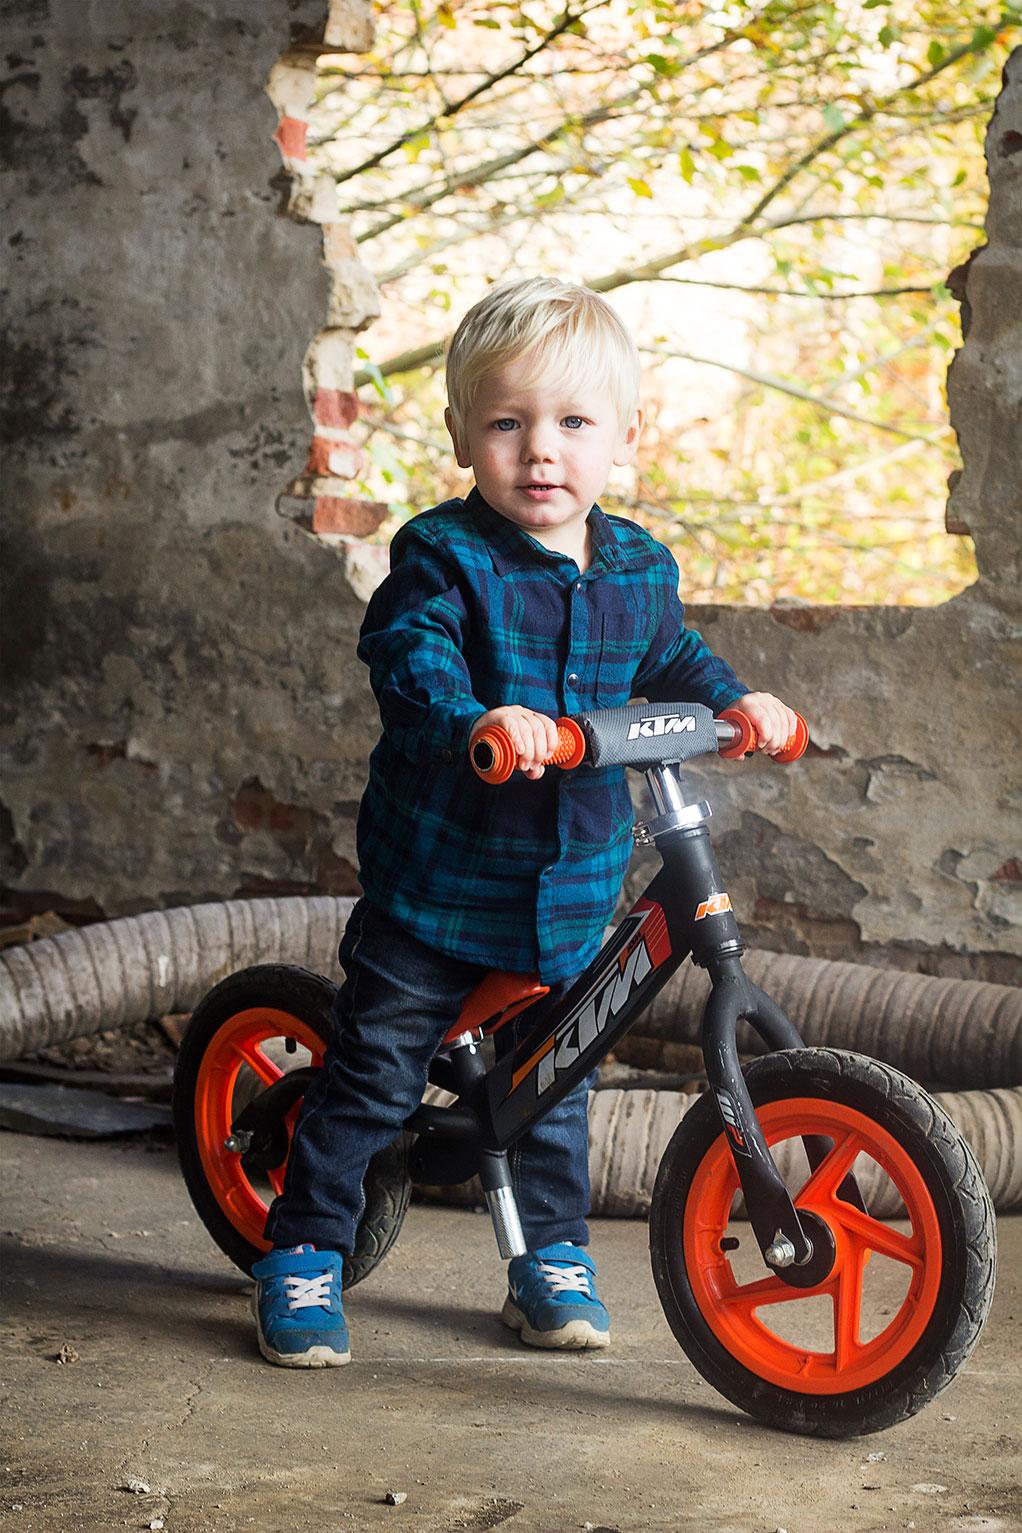 løbecykel-dreng-barn-fotografering